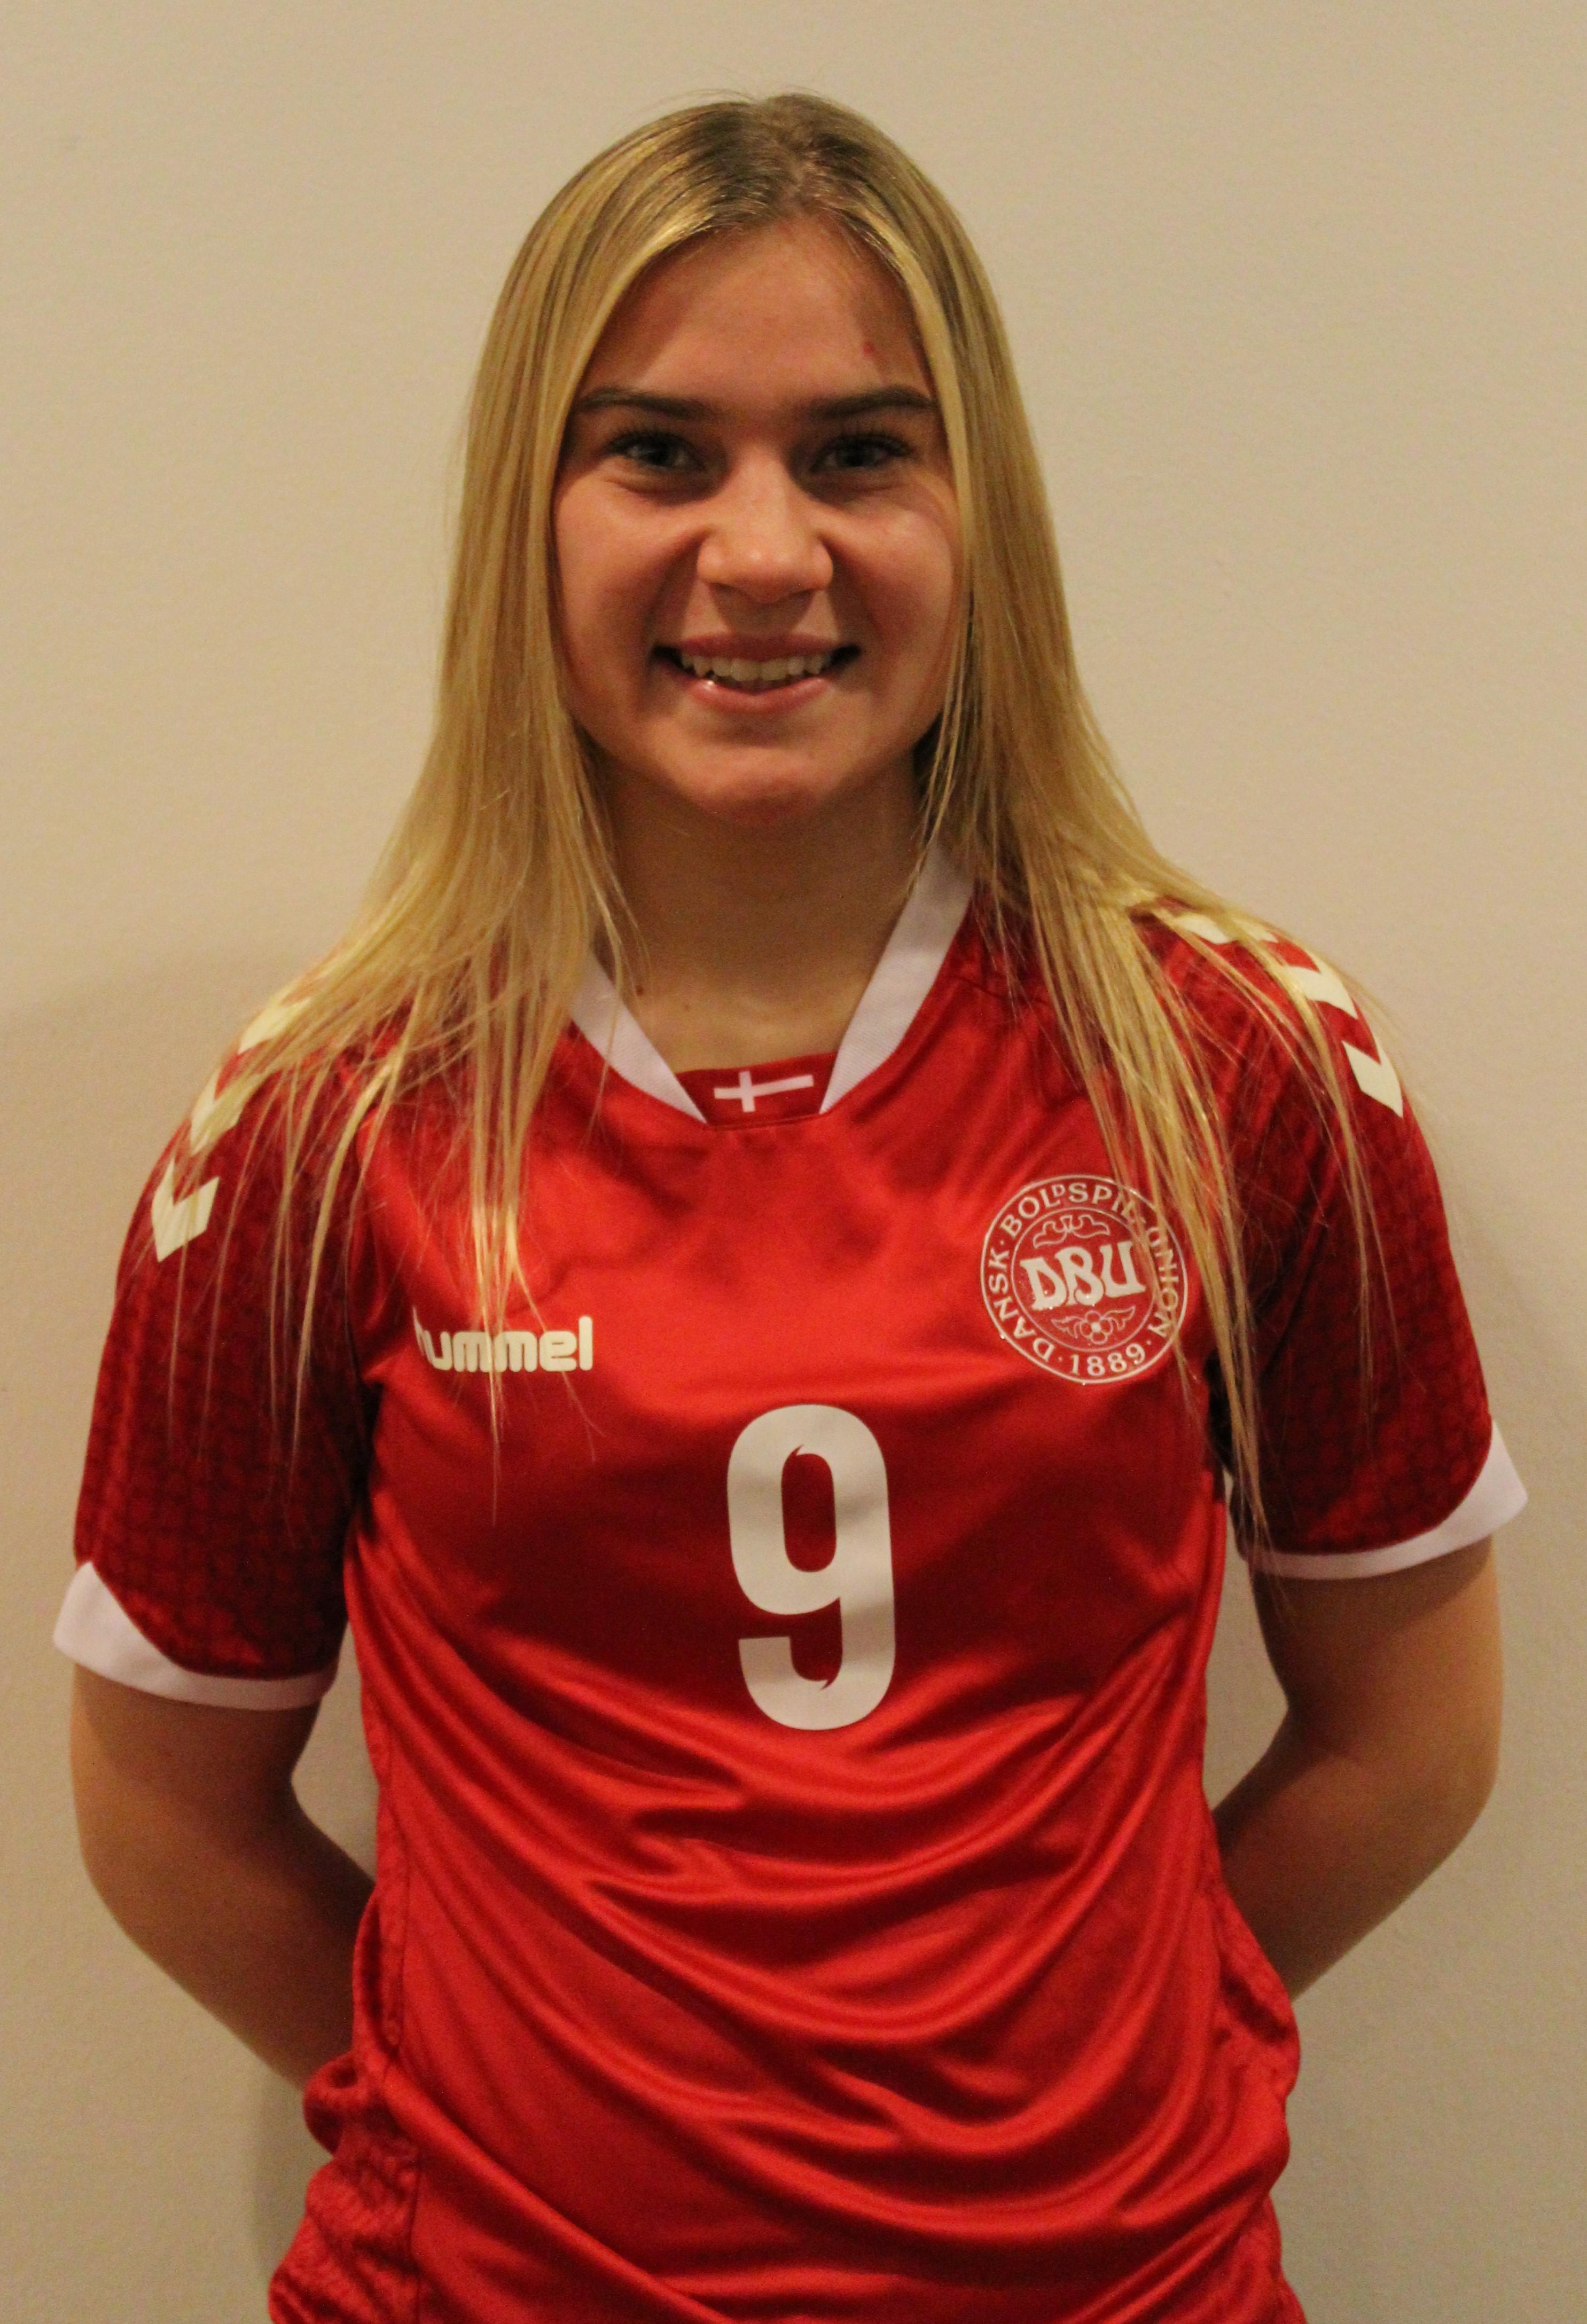 Sofie Hornemann